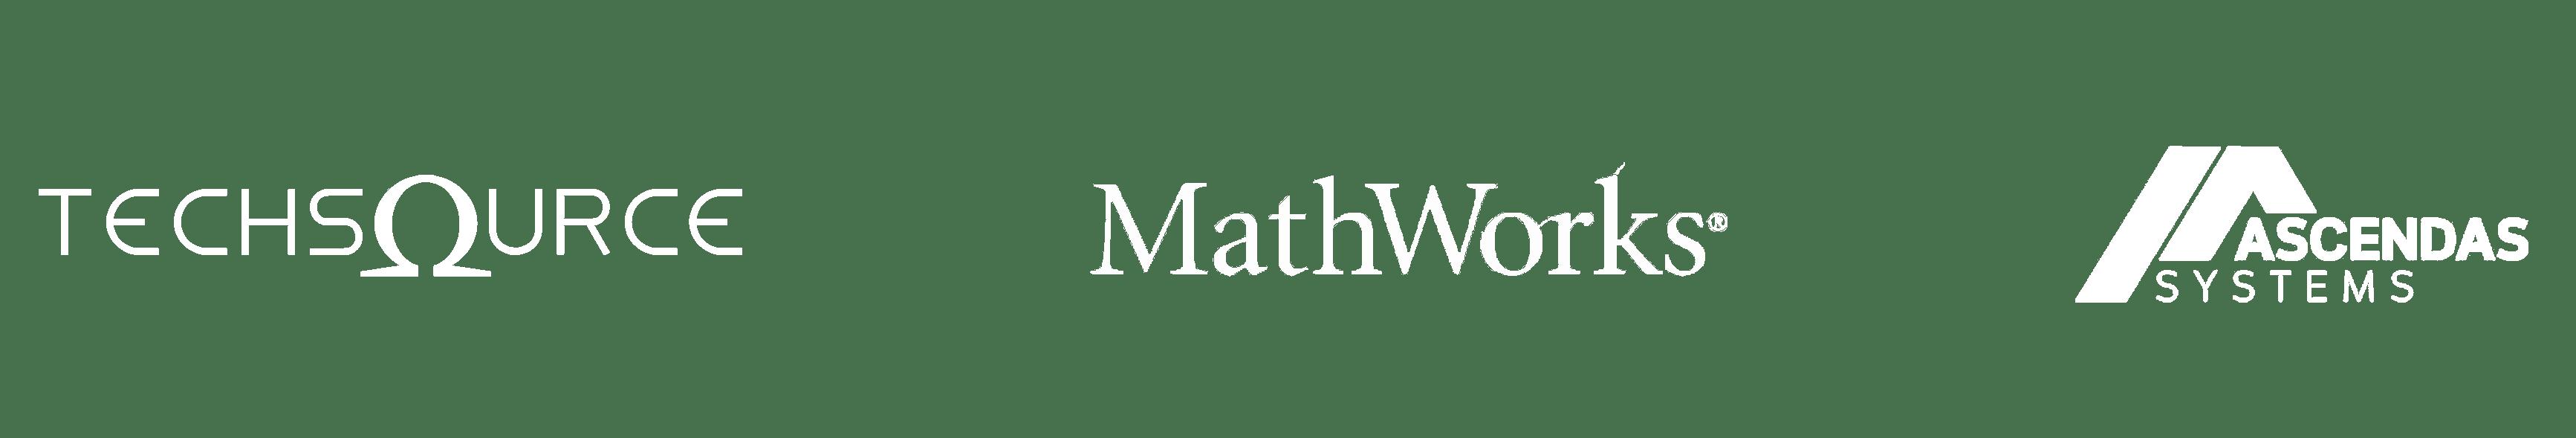 TechSource + MathWorks + Ascendas logos